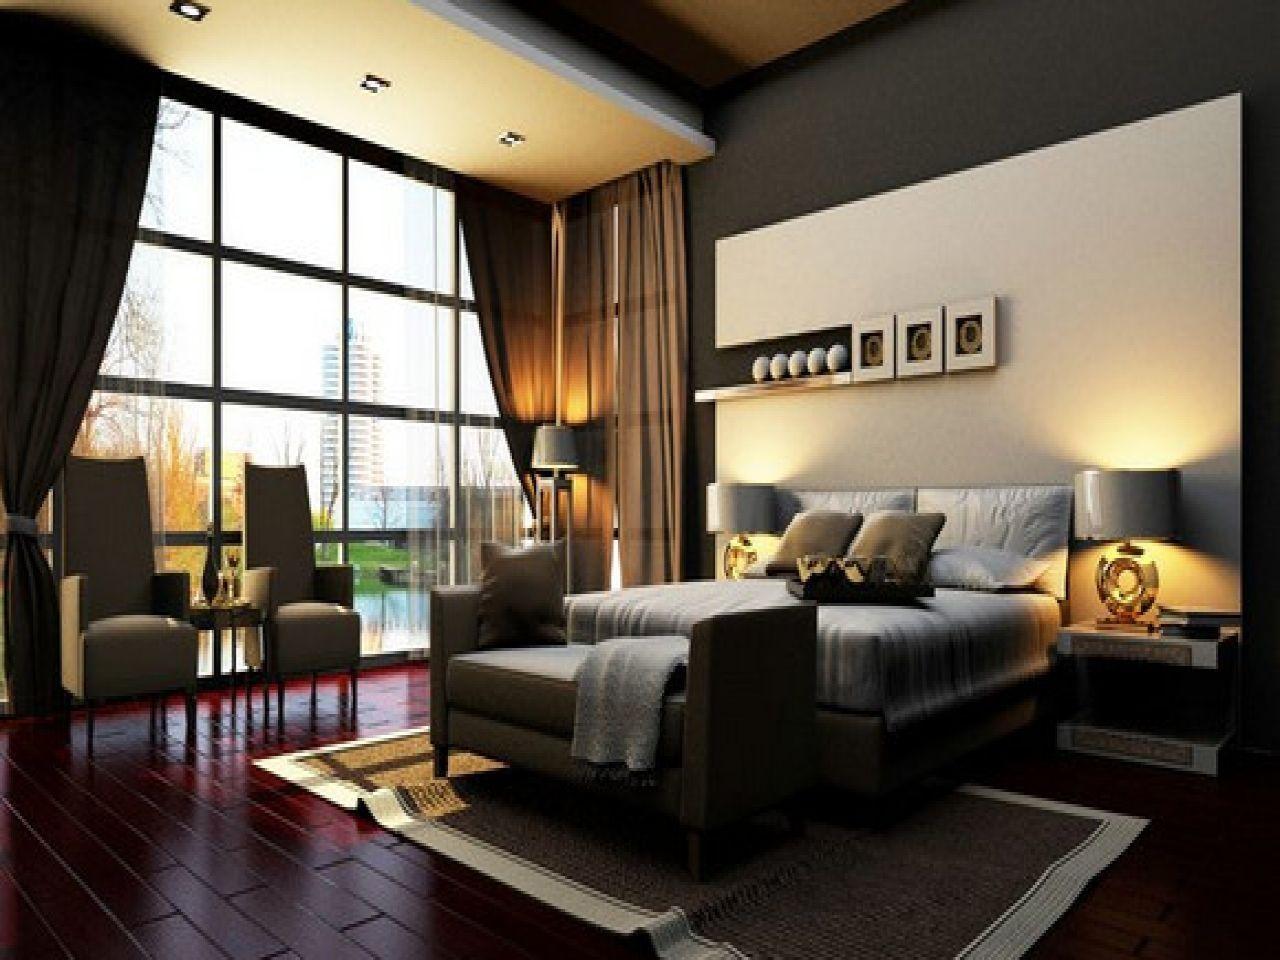 46 classic mater bedroom ideas